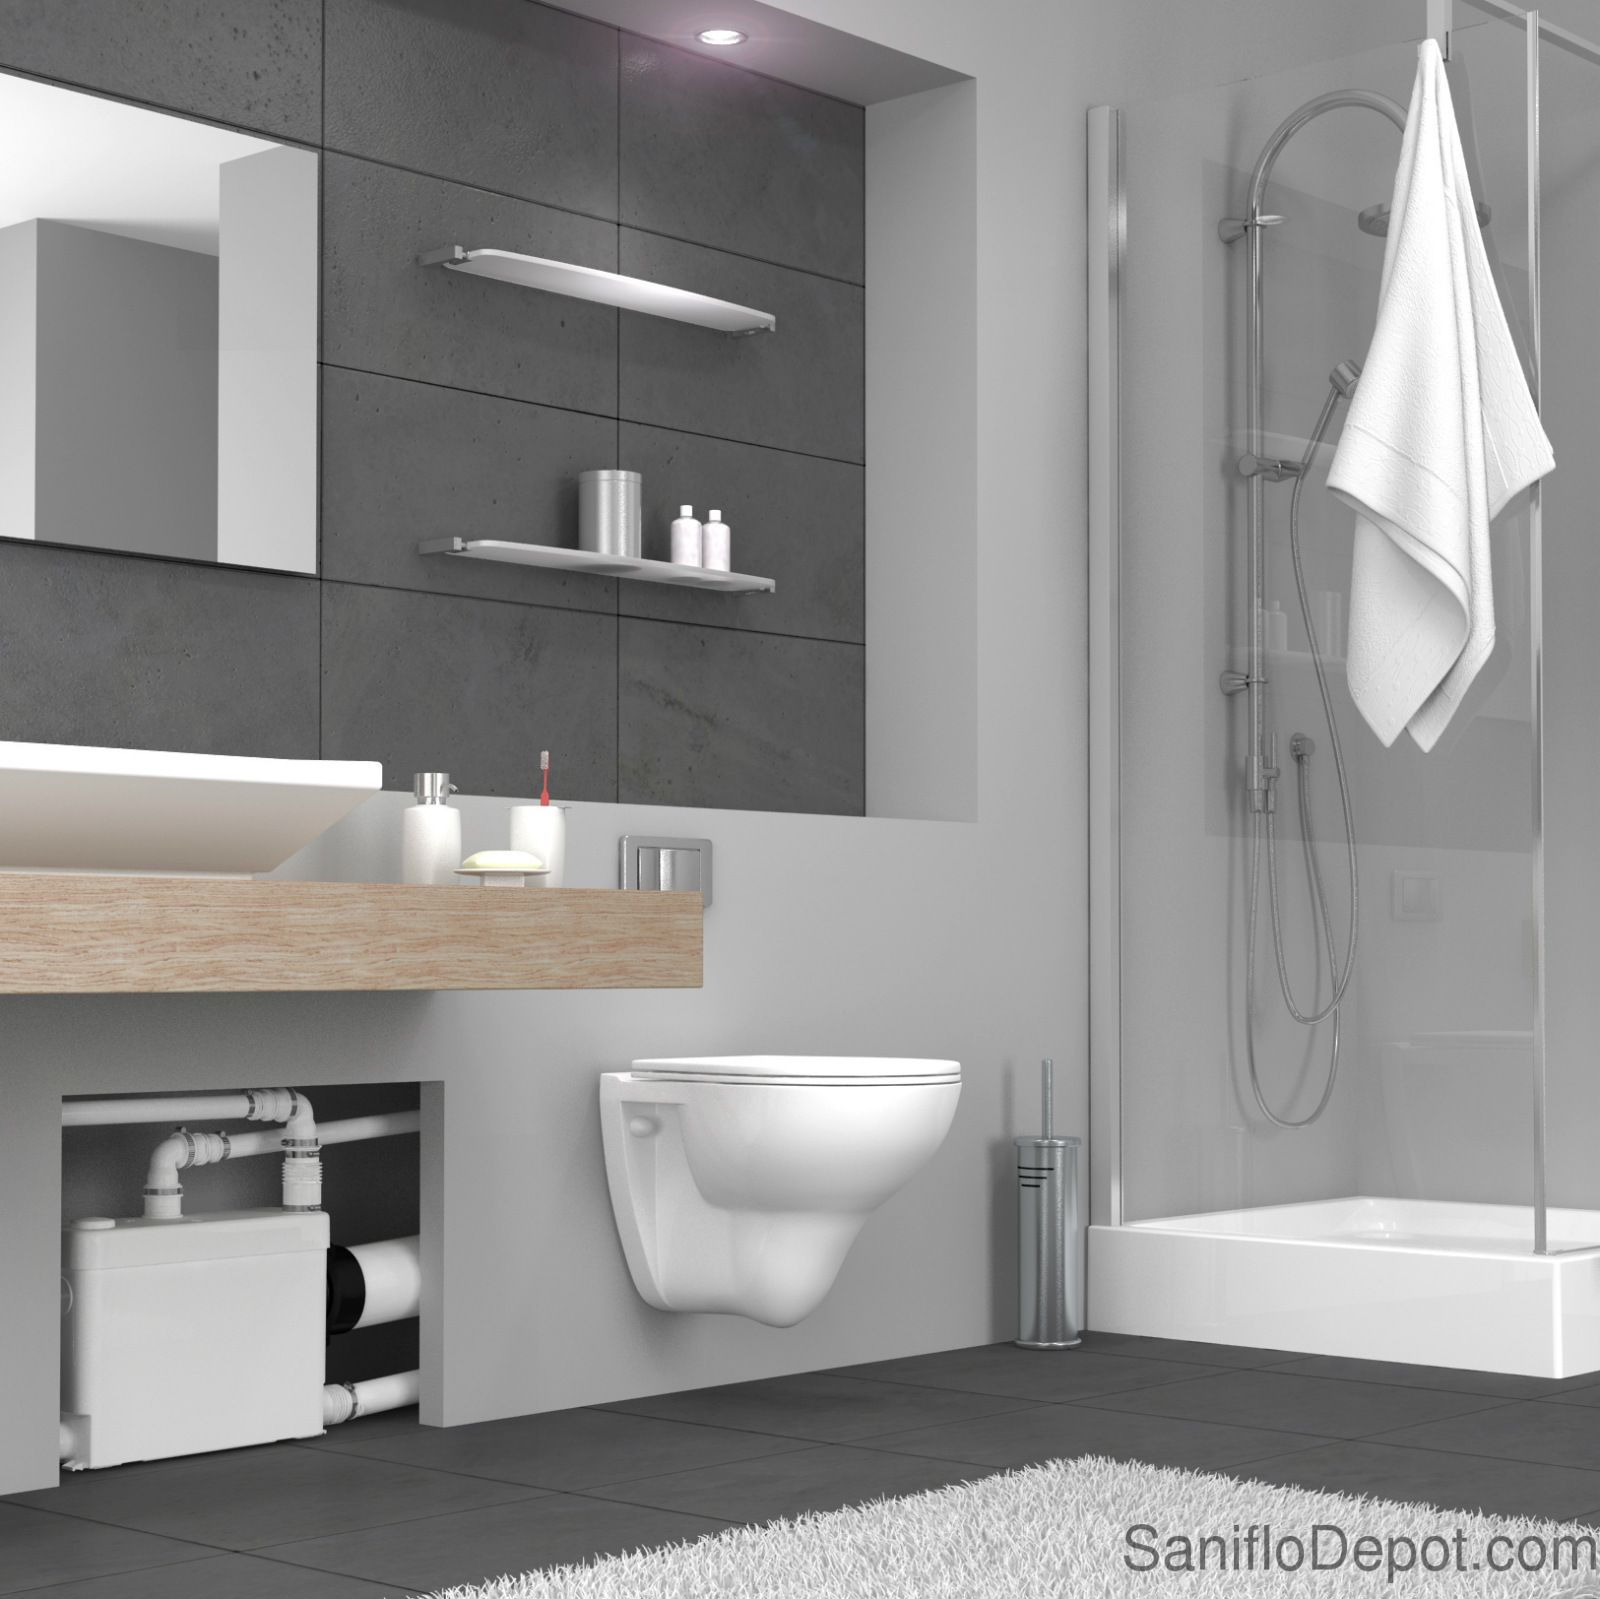 Saniflo Sanipack Macerating Upflush Toilet Upflush Toilet Bathroom Layout Bathroom Design